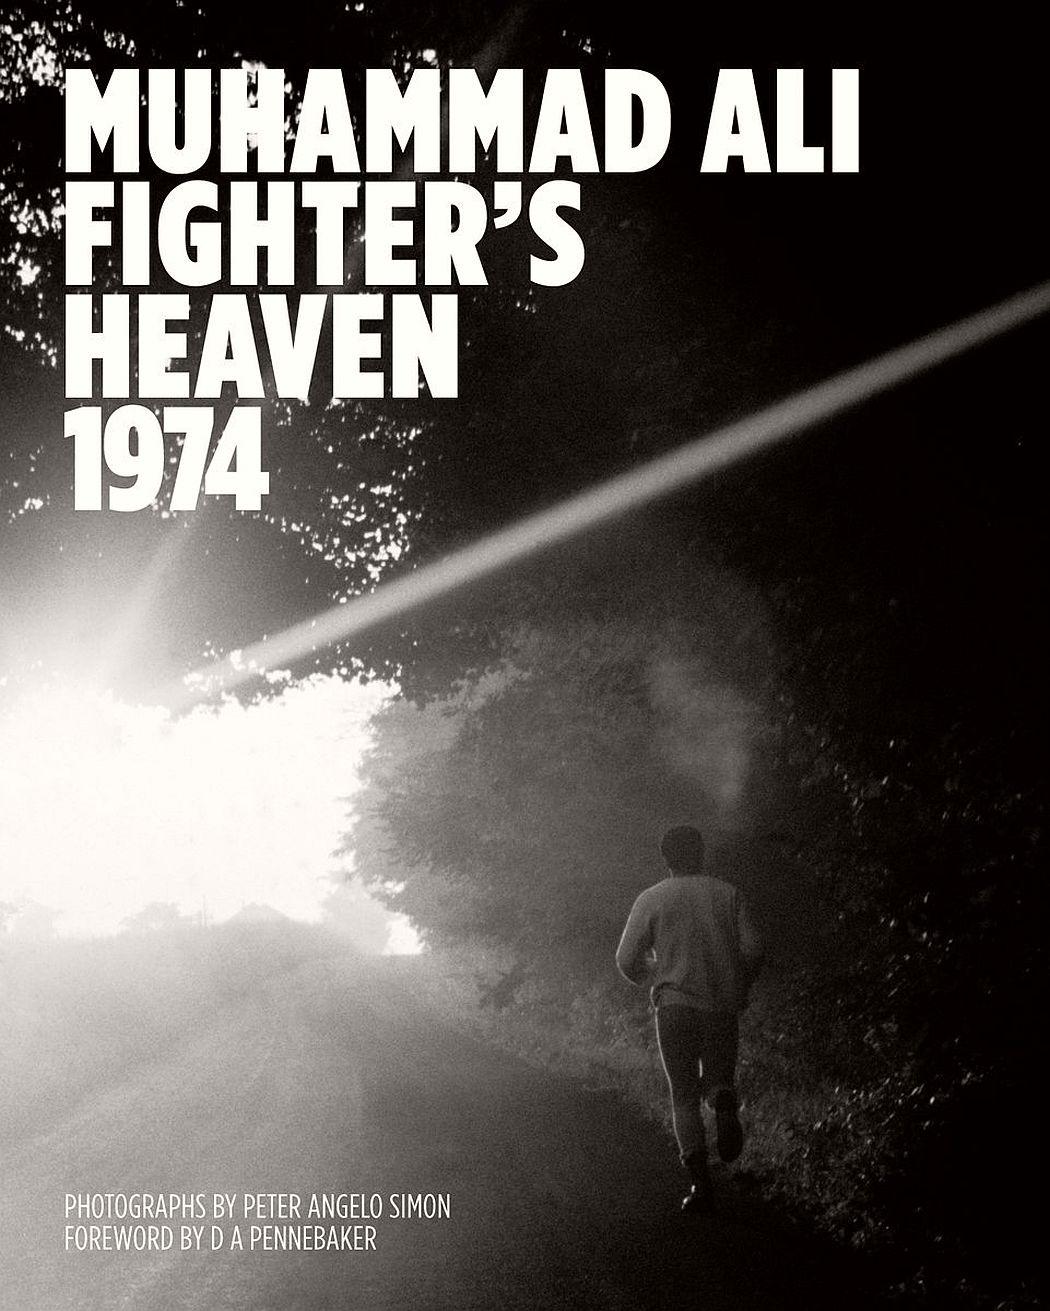 muhammad-ali-fighters-heaven-1974-00-cover